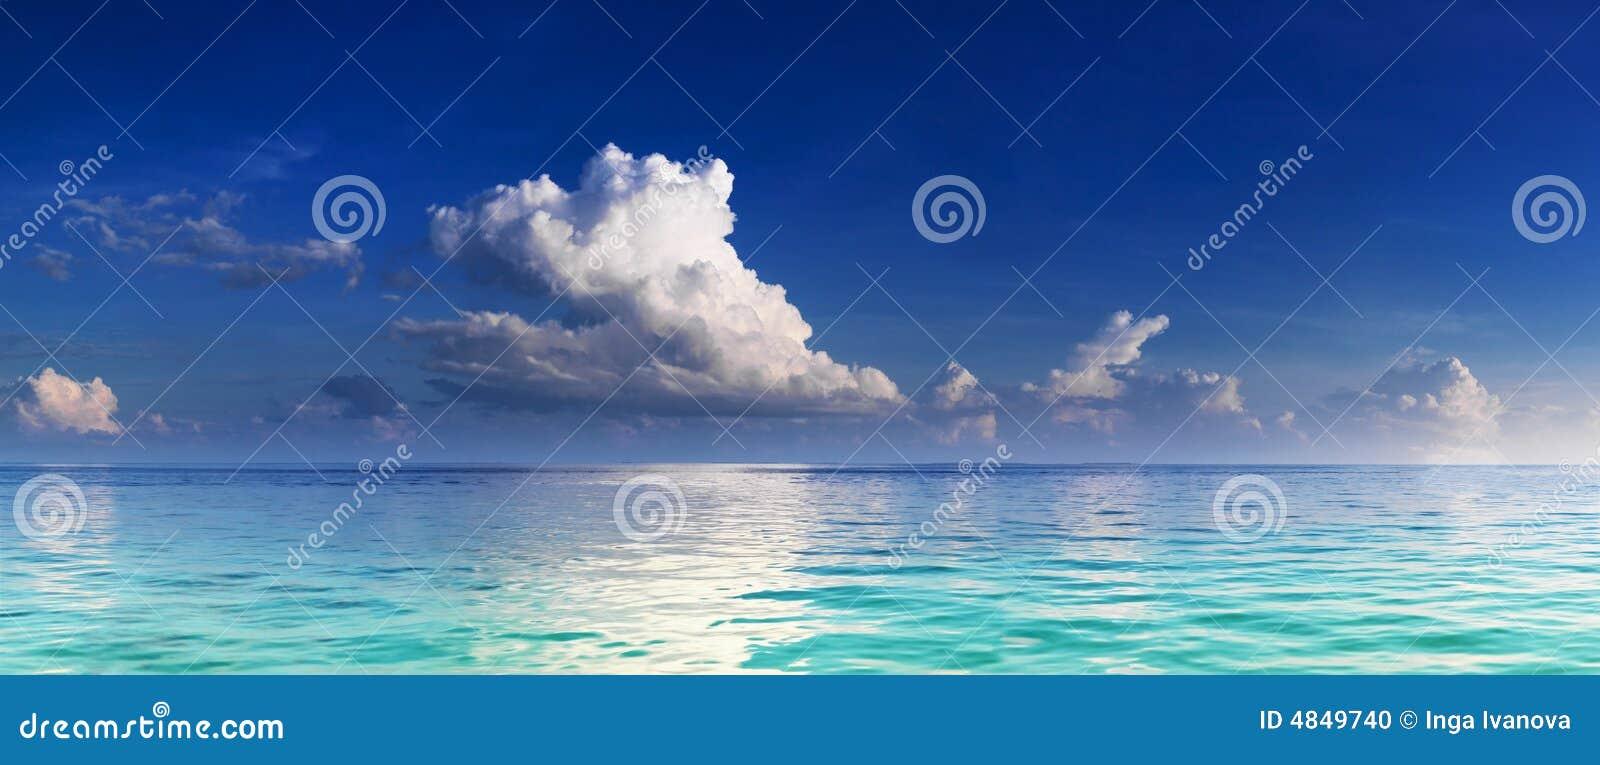 Panorama of turquoise lagoon